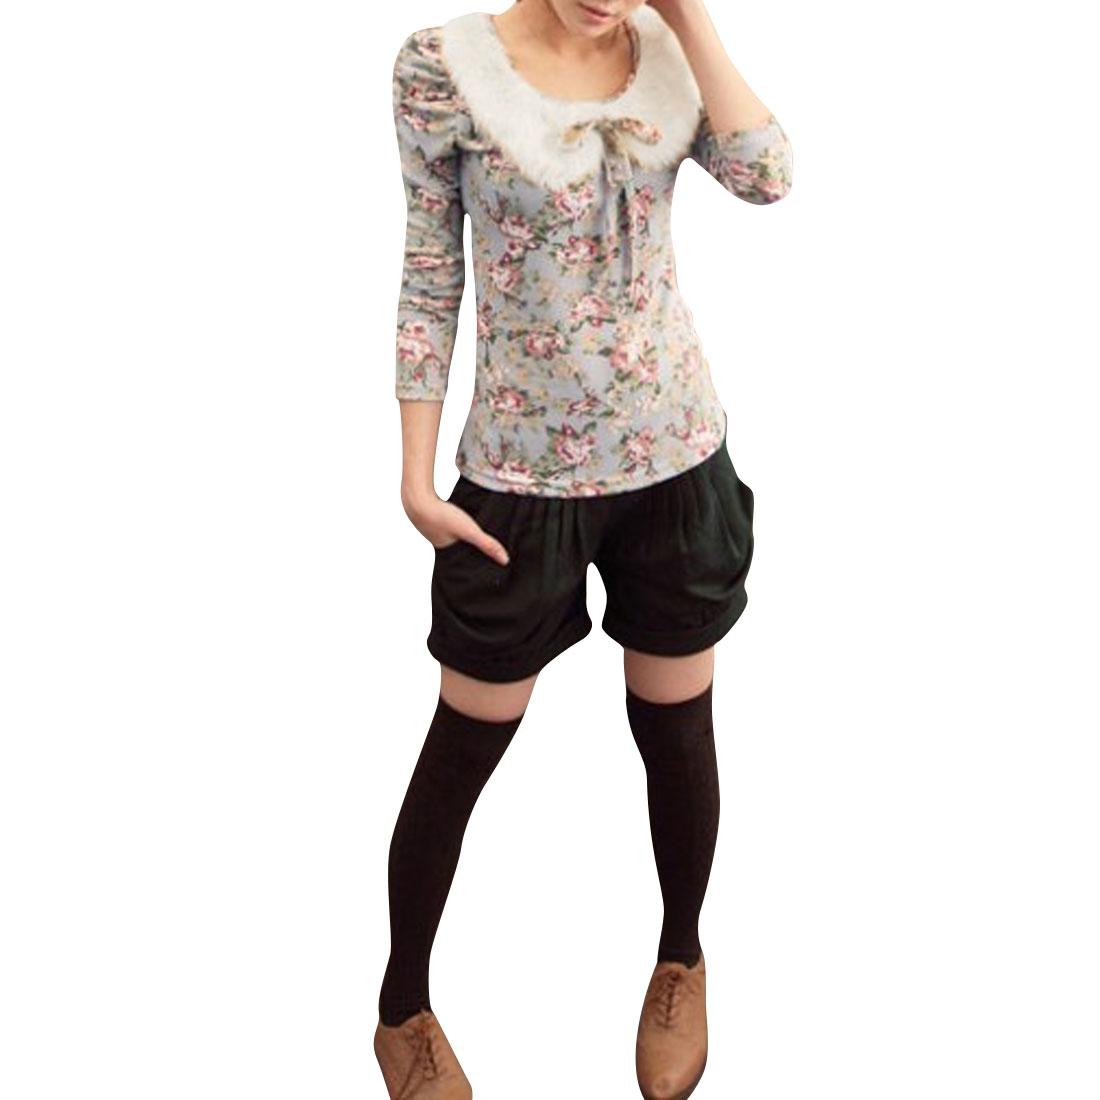 Ladies Light Blue Peter Pan Collar Bubble Sleeve Floral Prints Top Shirt XS